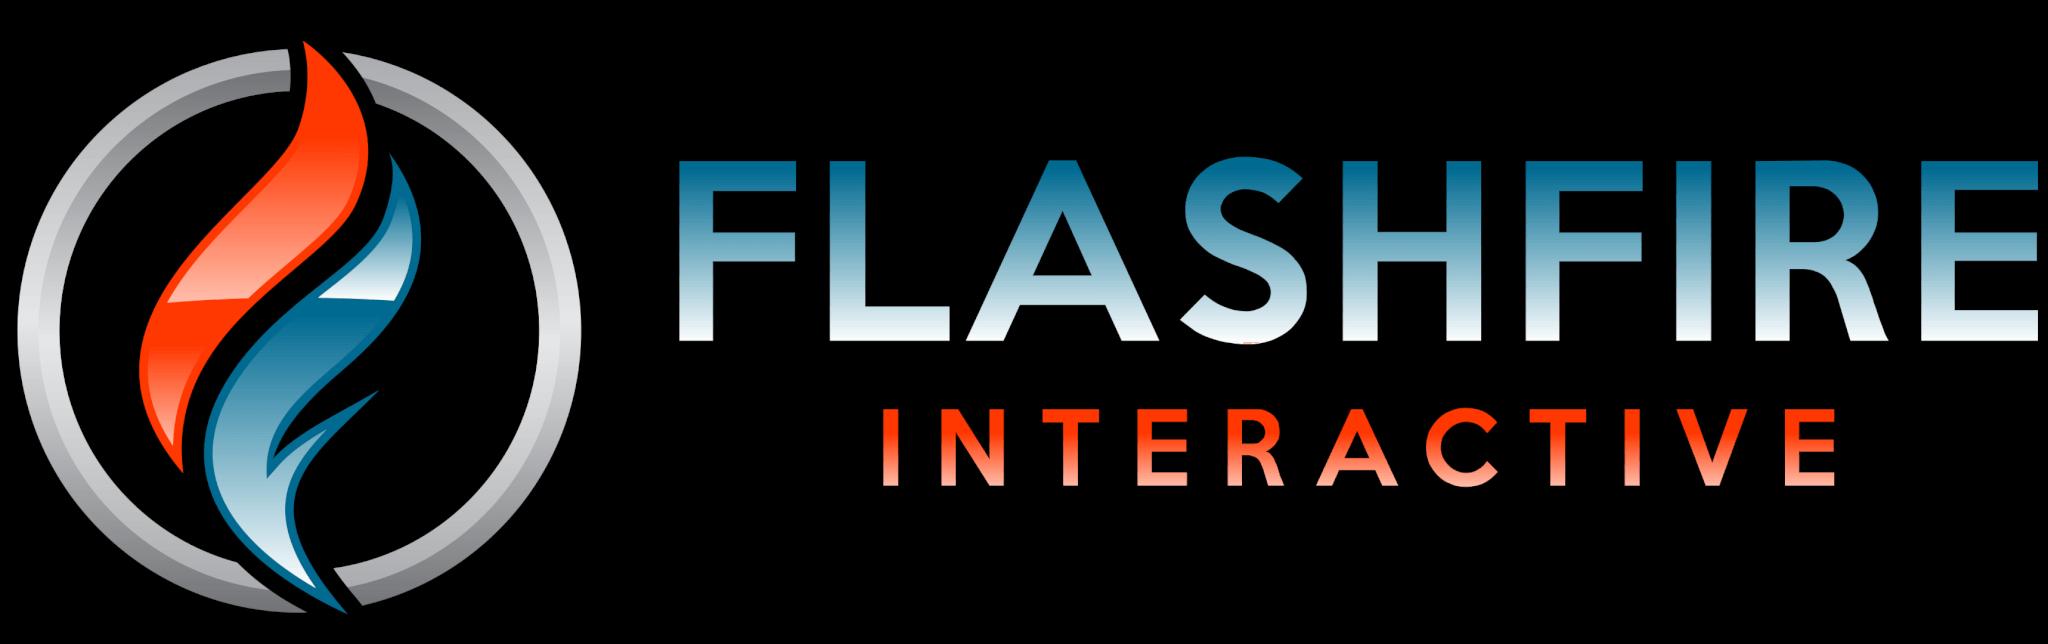 website design flashfire interactive